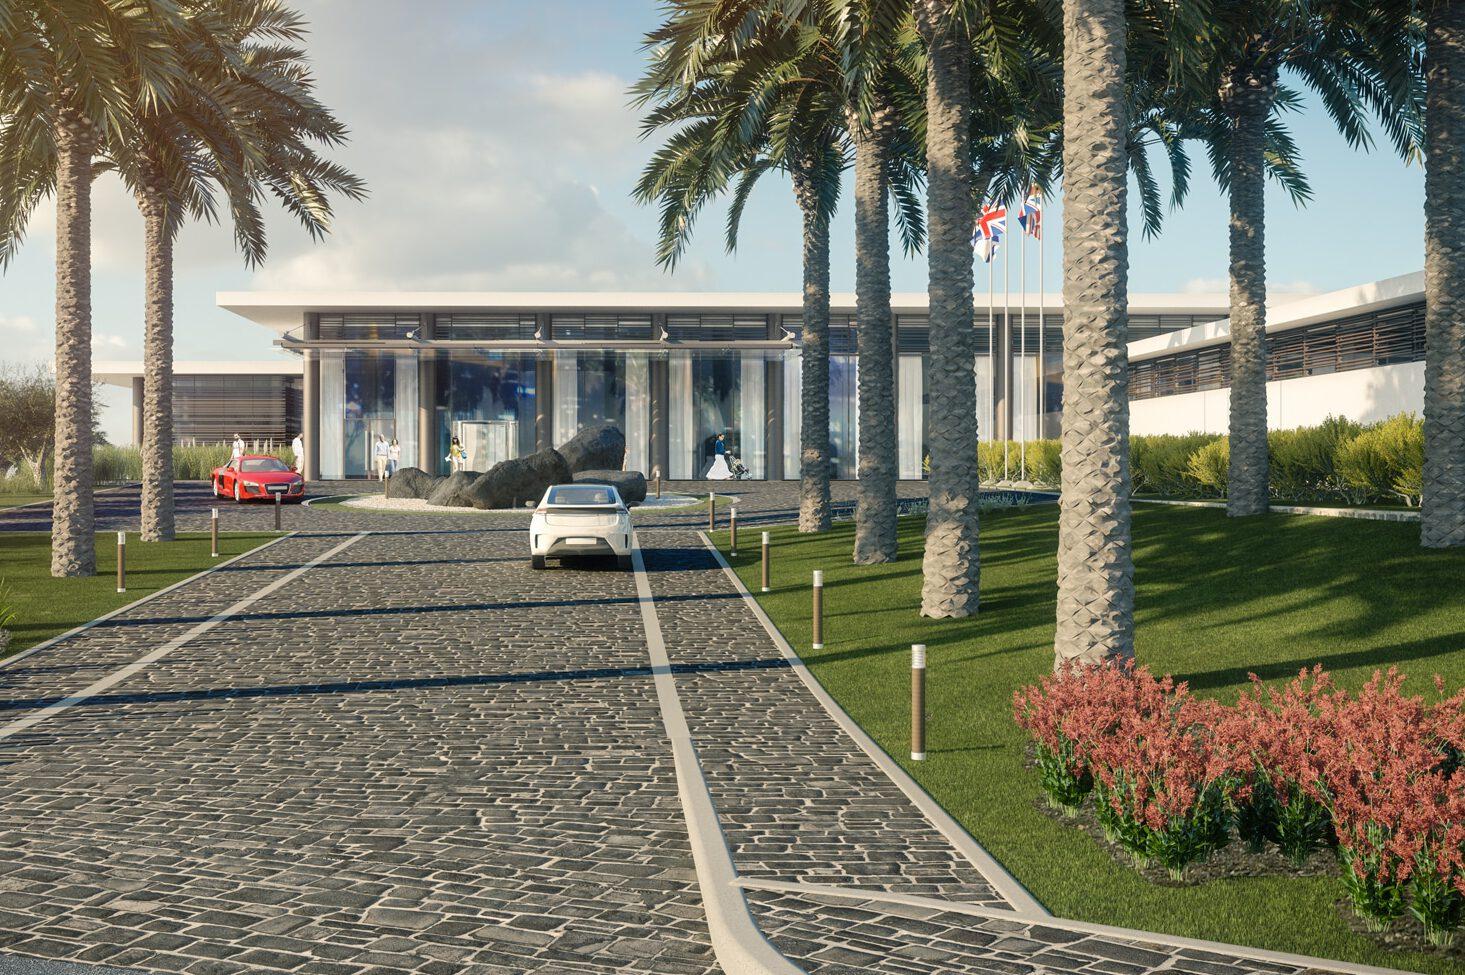 EIN GEV RESORT HOTEL SEA OF GALILEE